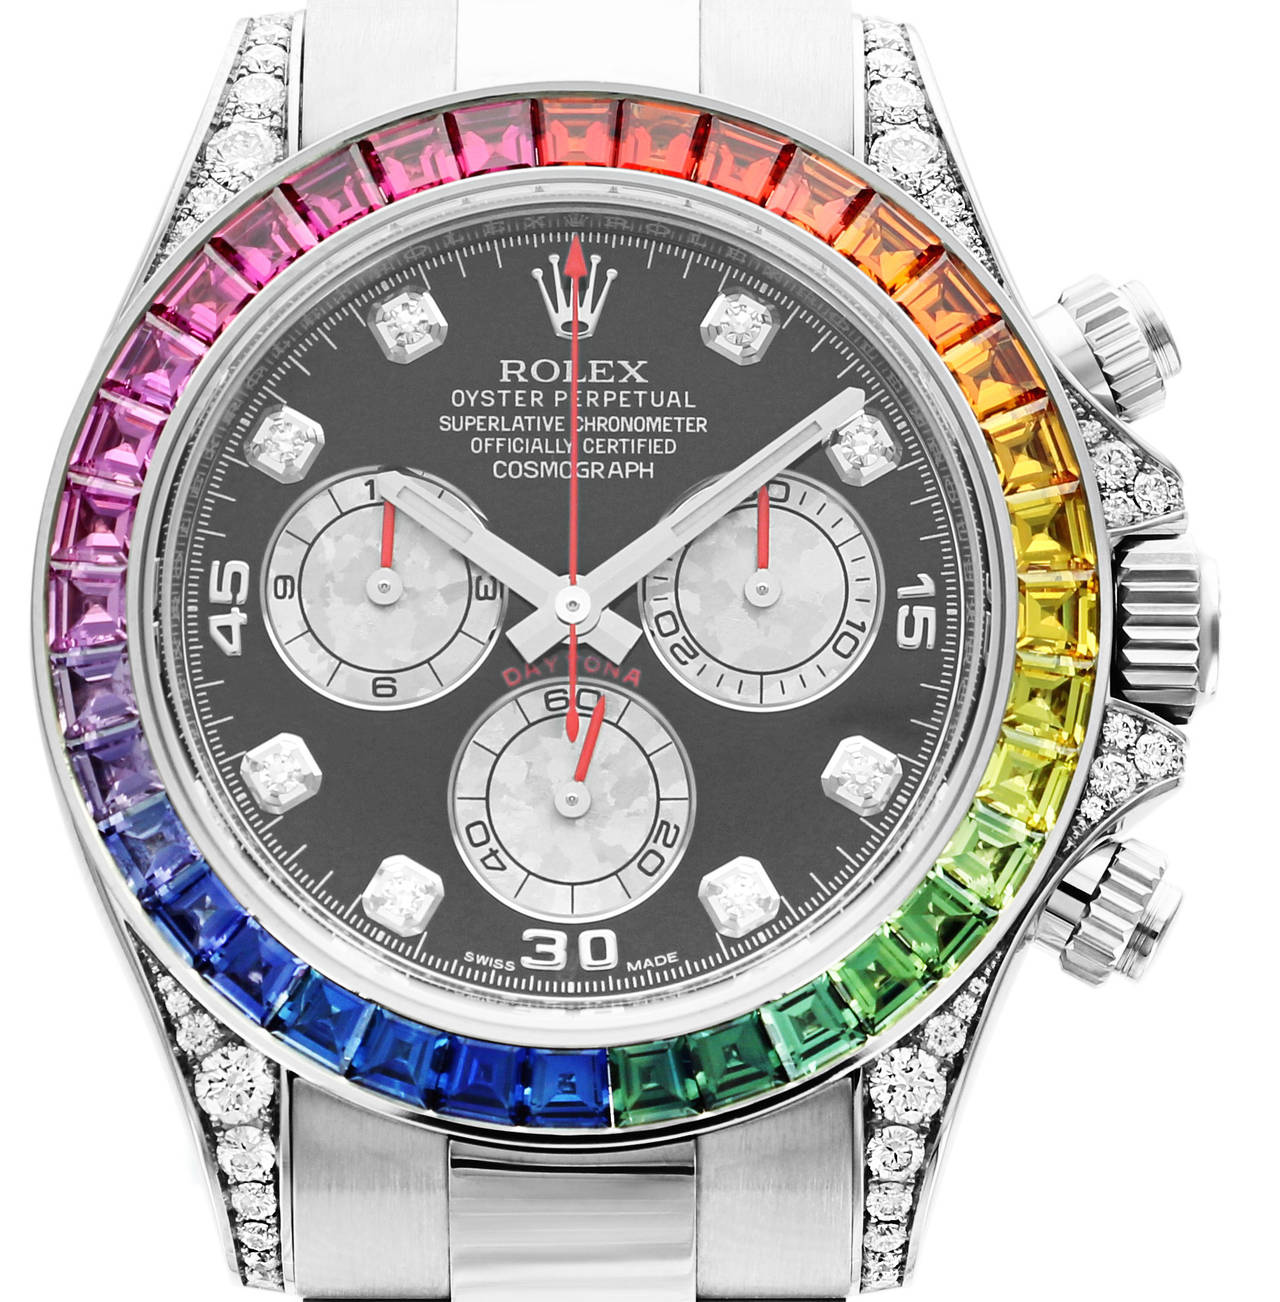 rolex white gold daytona rainbow chronometer wristwatch ref 116599 at 1stdibs. Black Bedroom Furniture Sets. Home Design Ideas